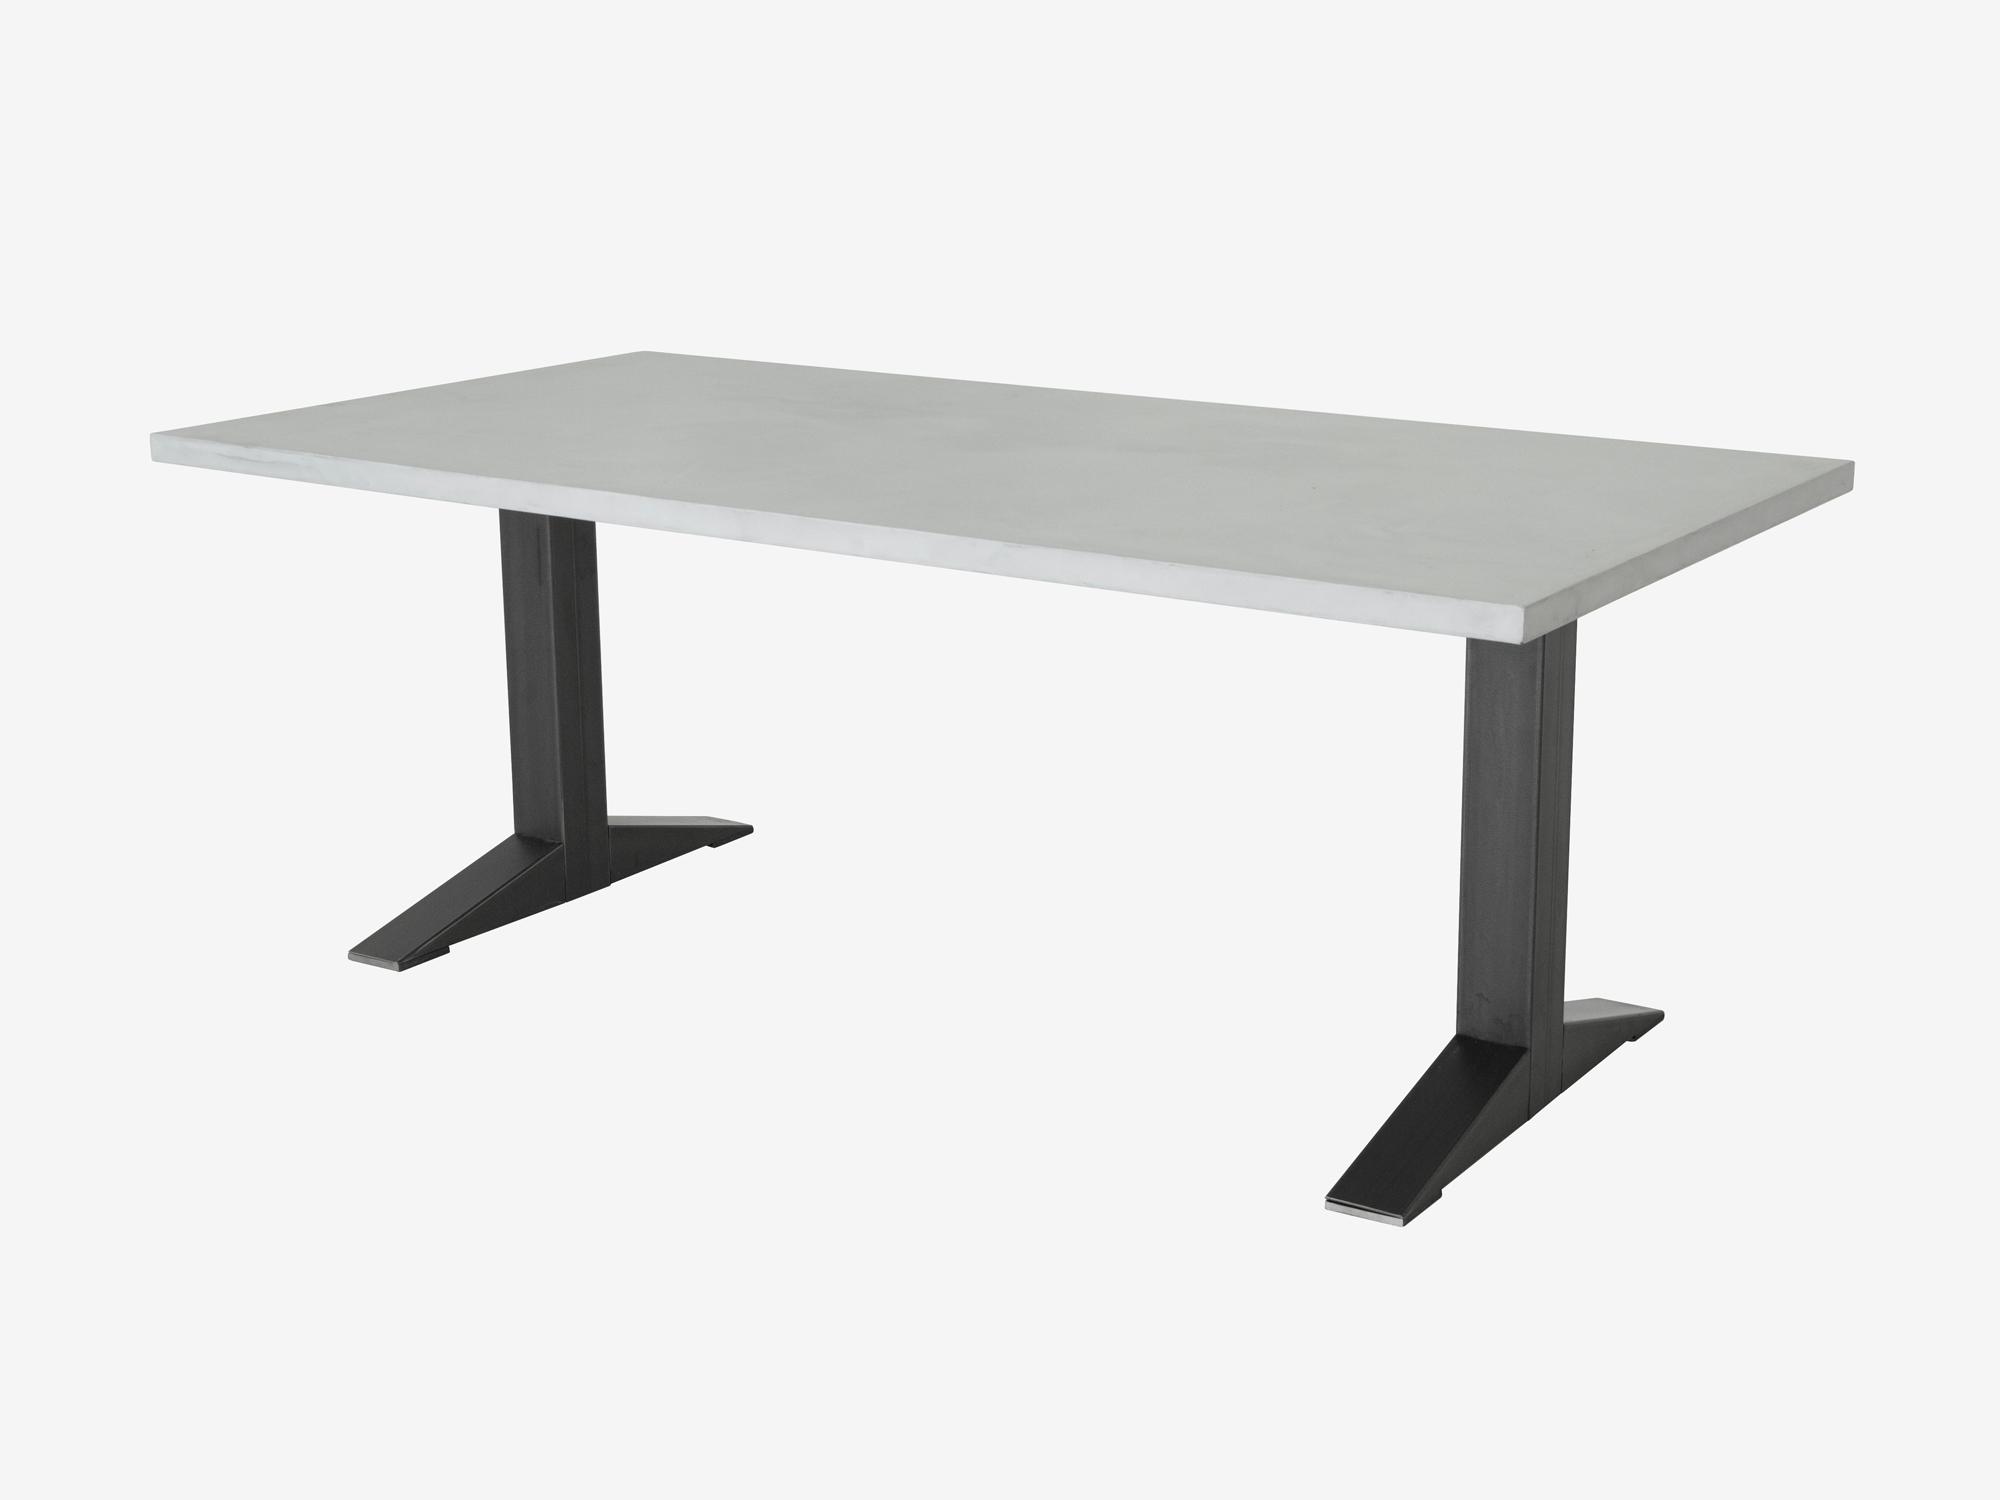 Tafel betonlook geven cheap qazqa industriele eettafel xx